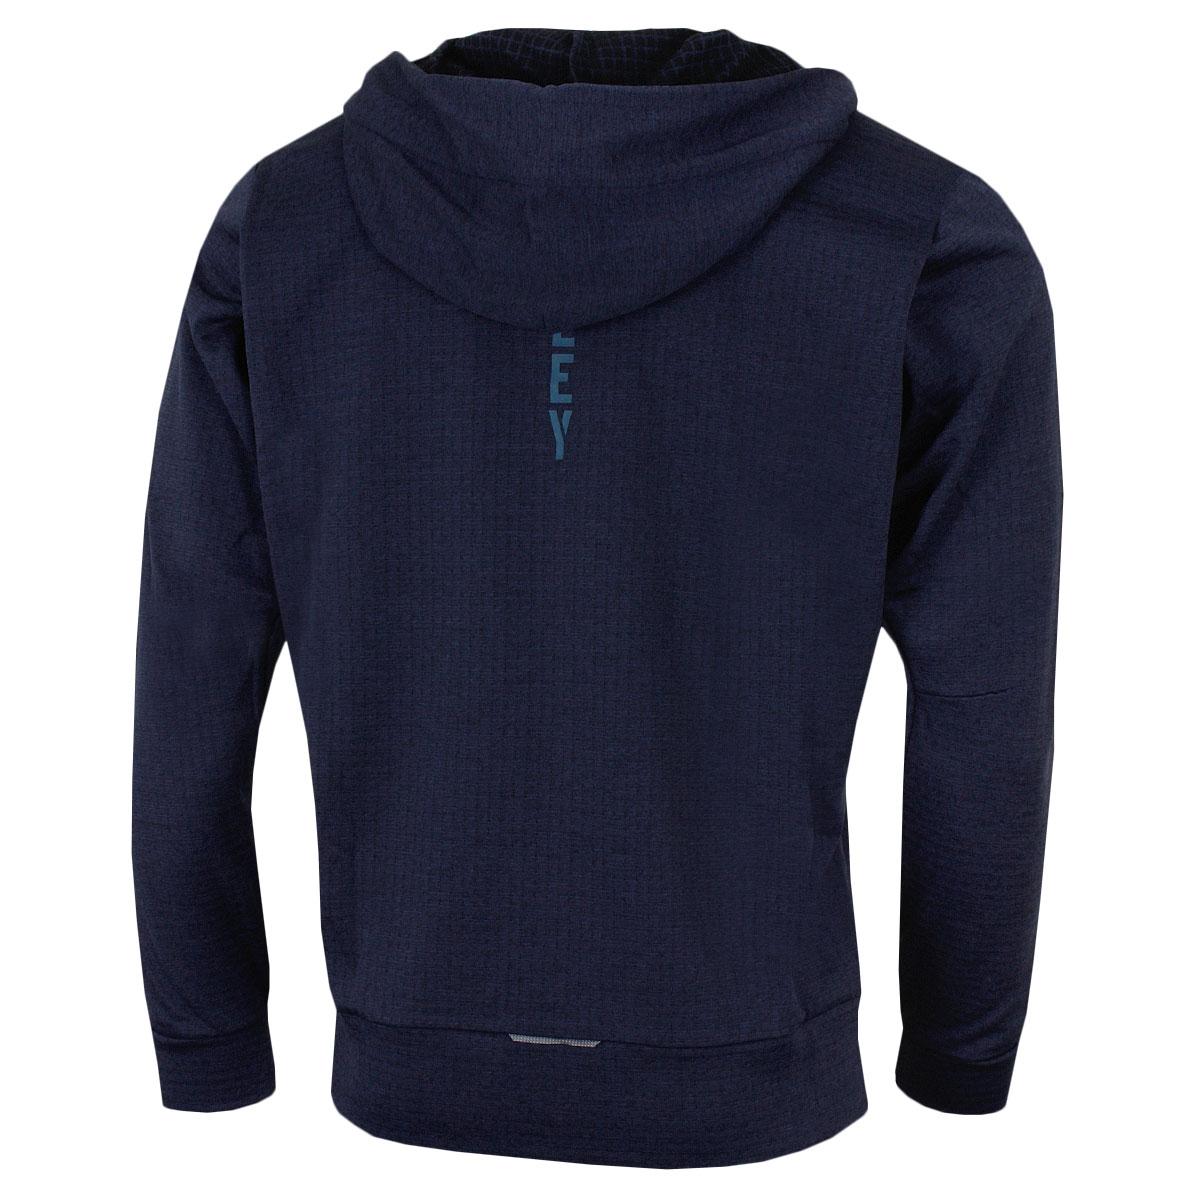 Oakley-Mens-Enhance-Tech-8-7-Quick-Drying-Fleece-Jacket-43-OFF-RRP thumbnail 5